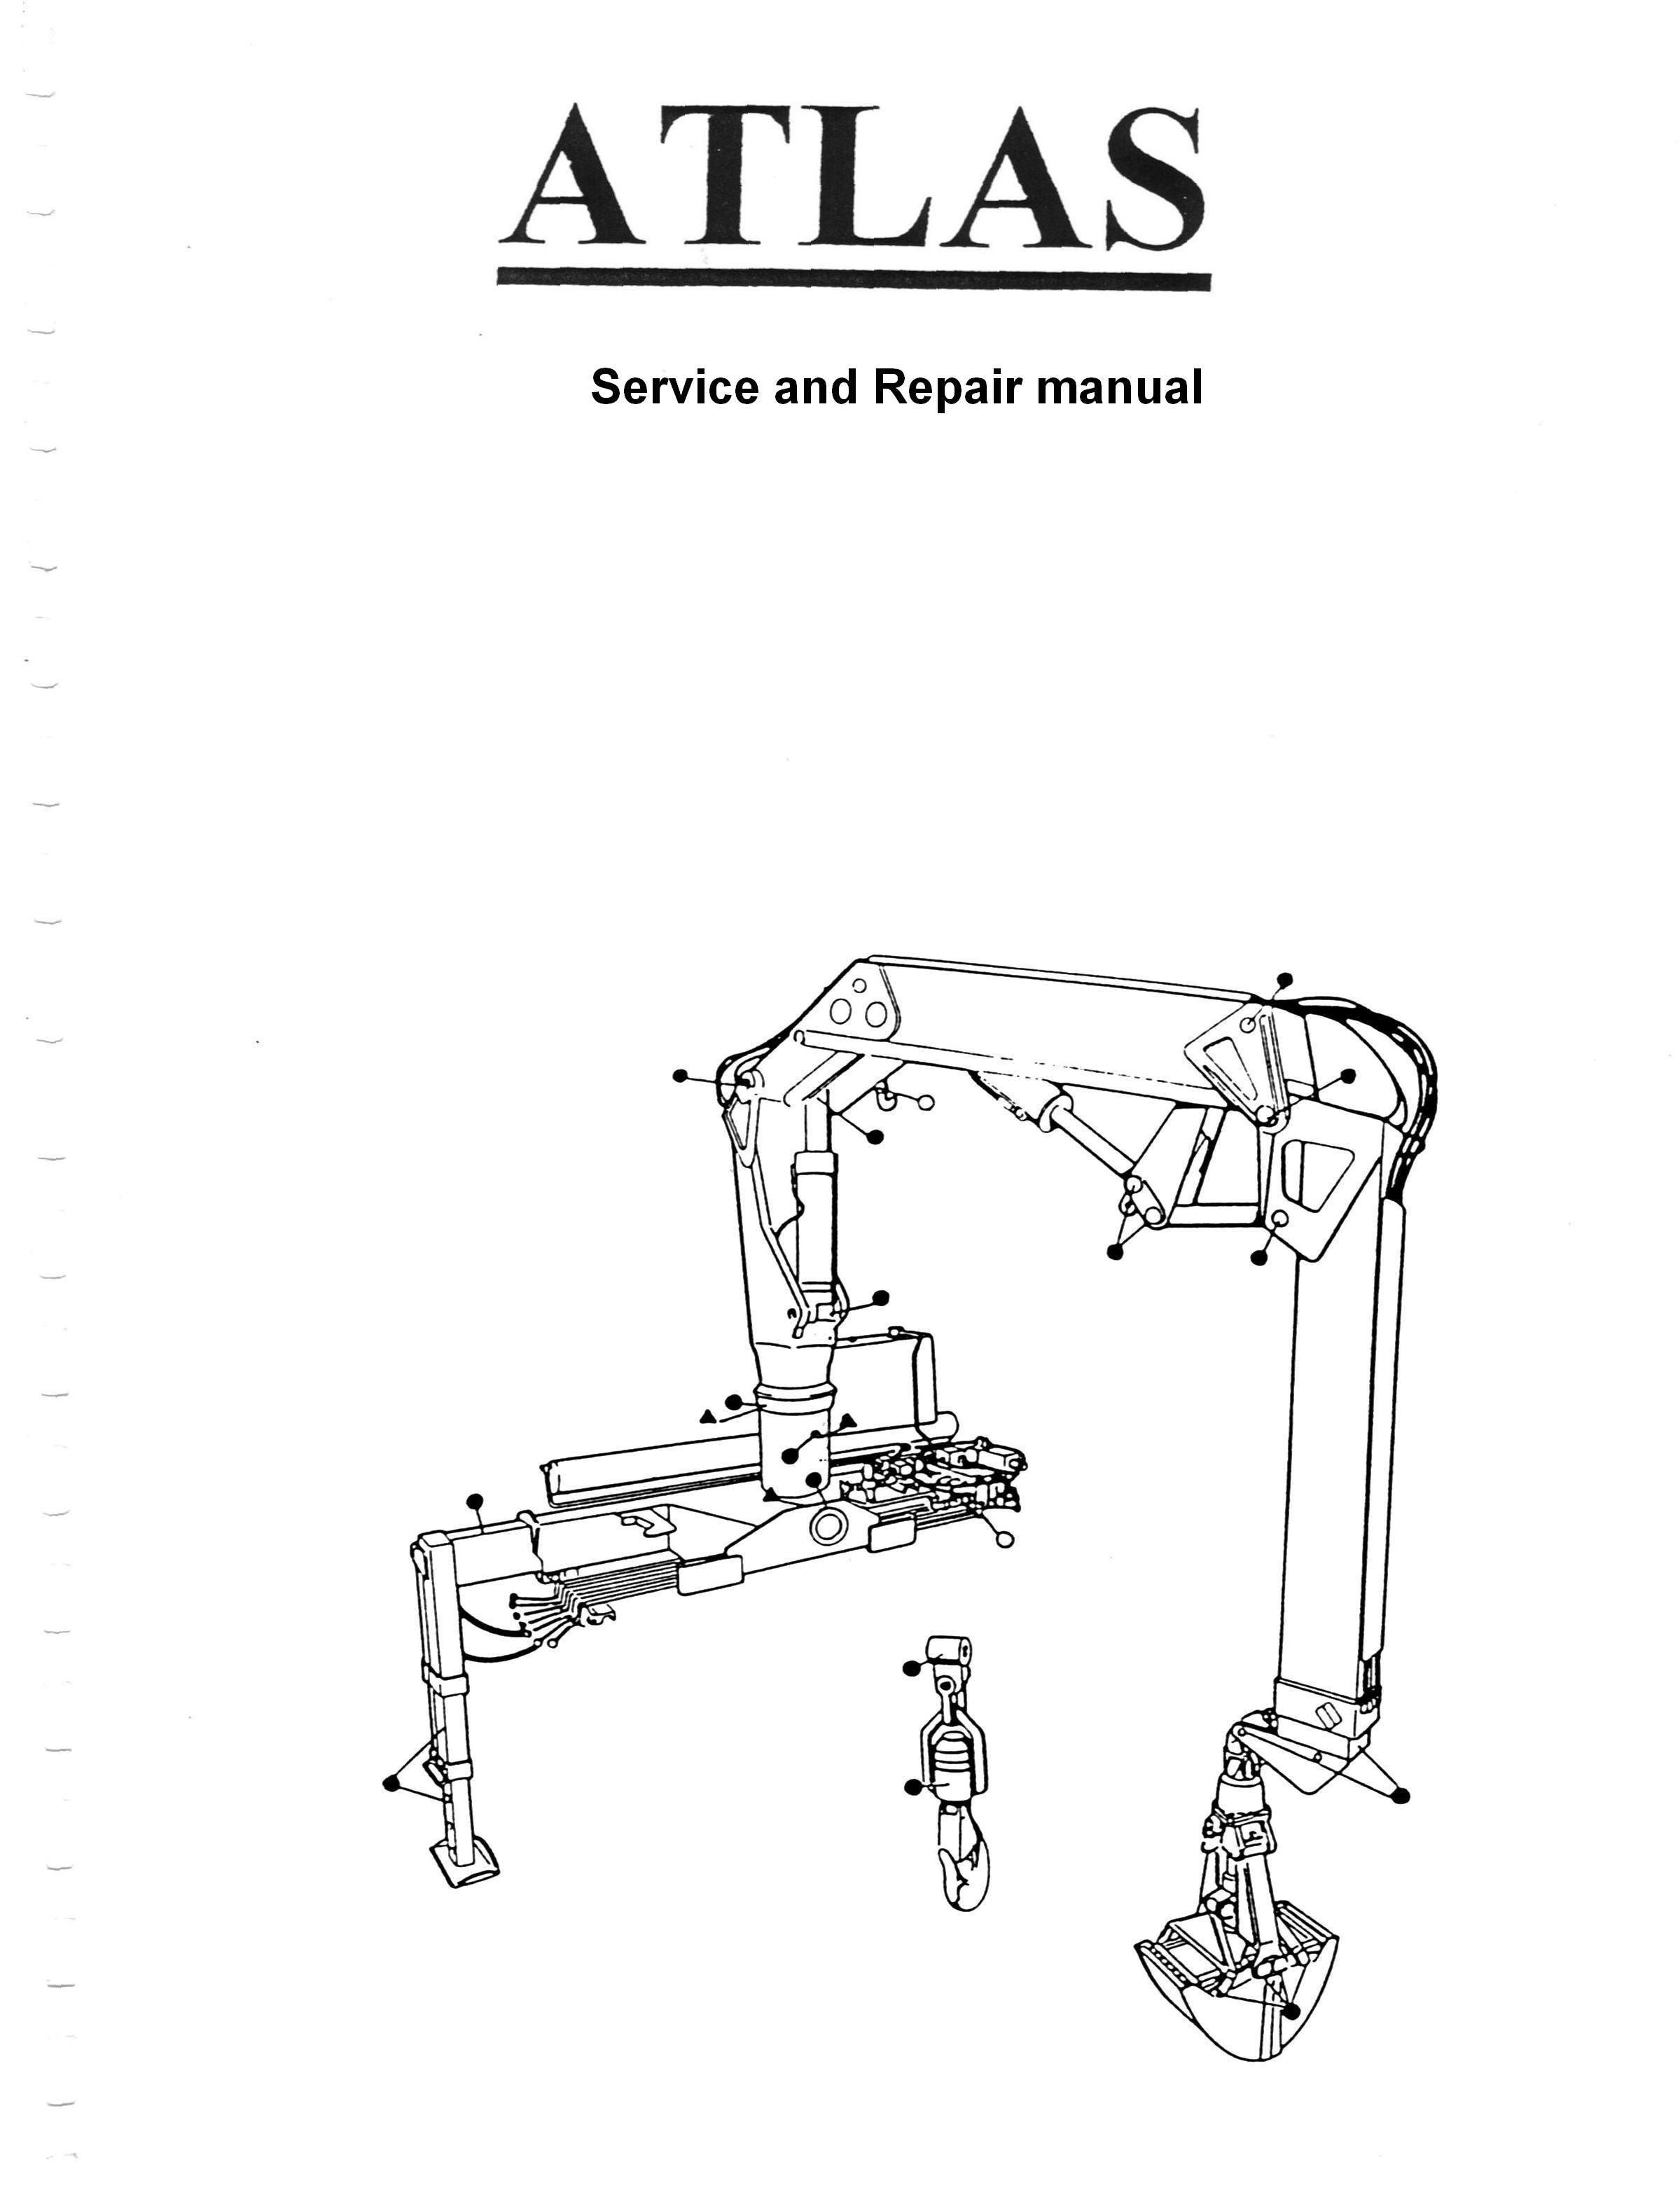 atlas 100 1 operators manual